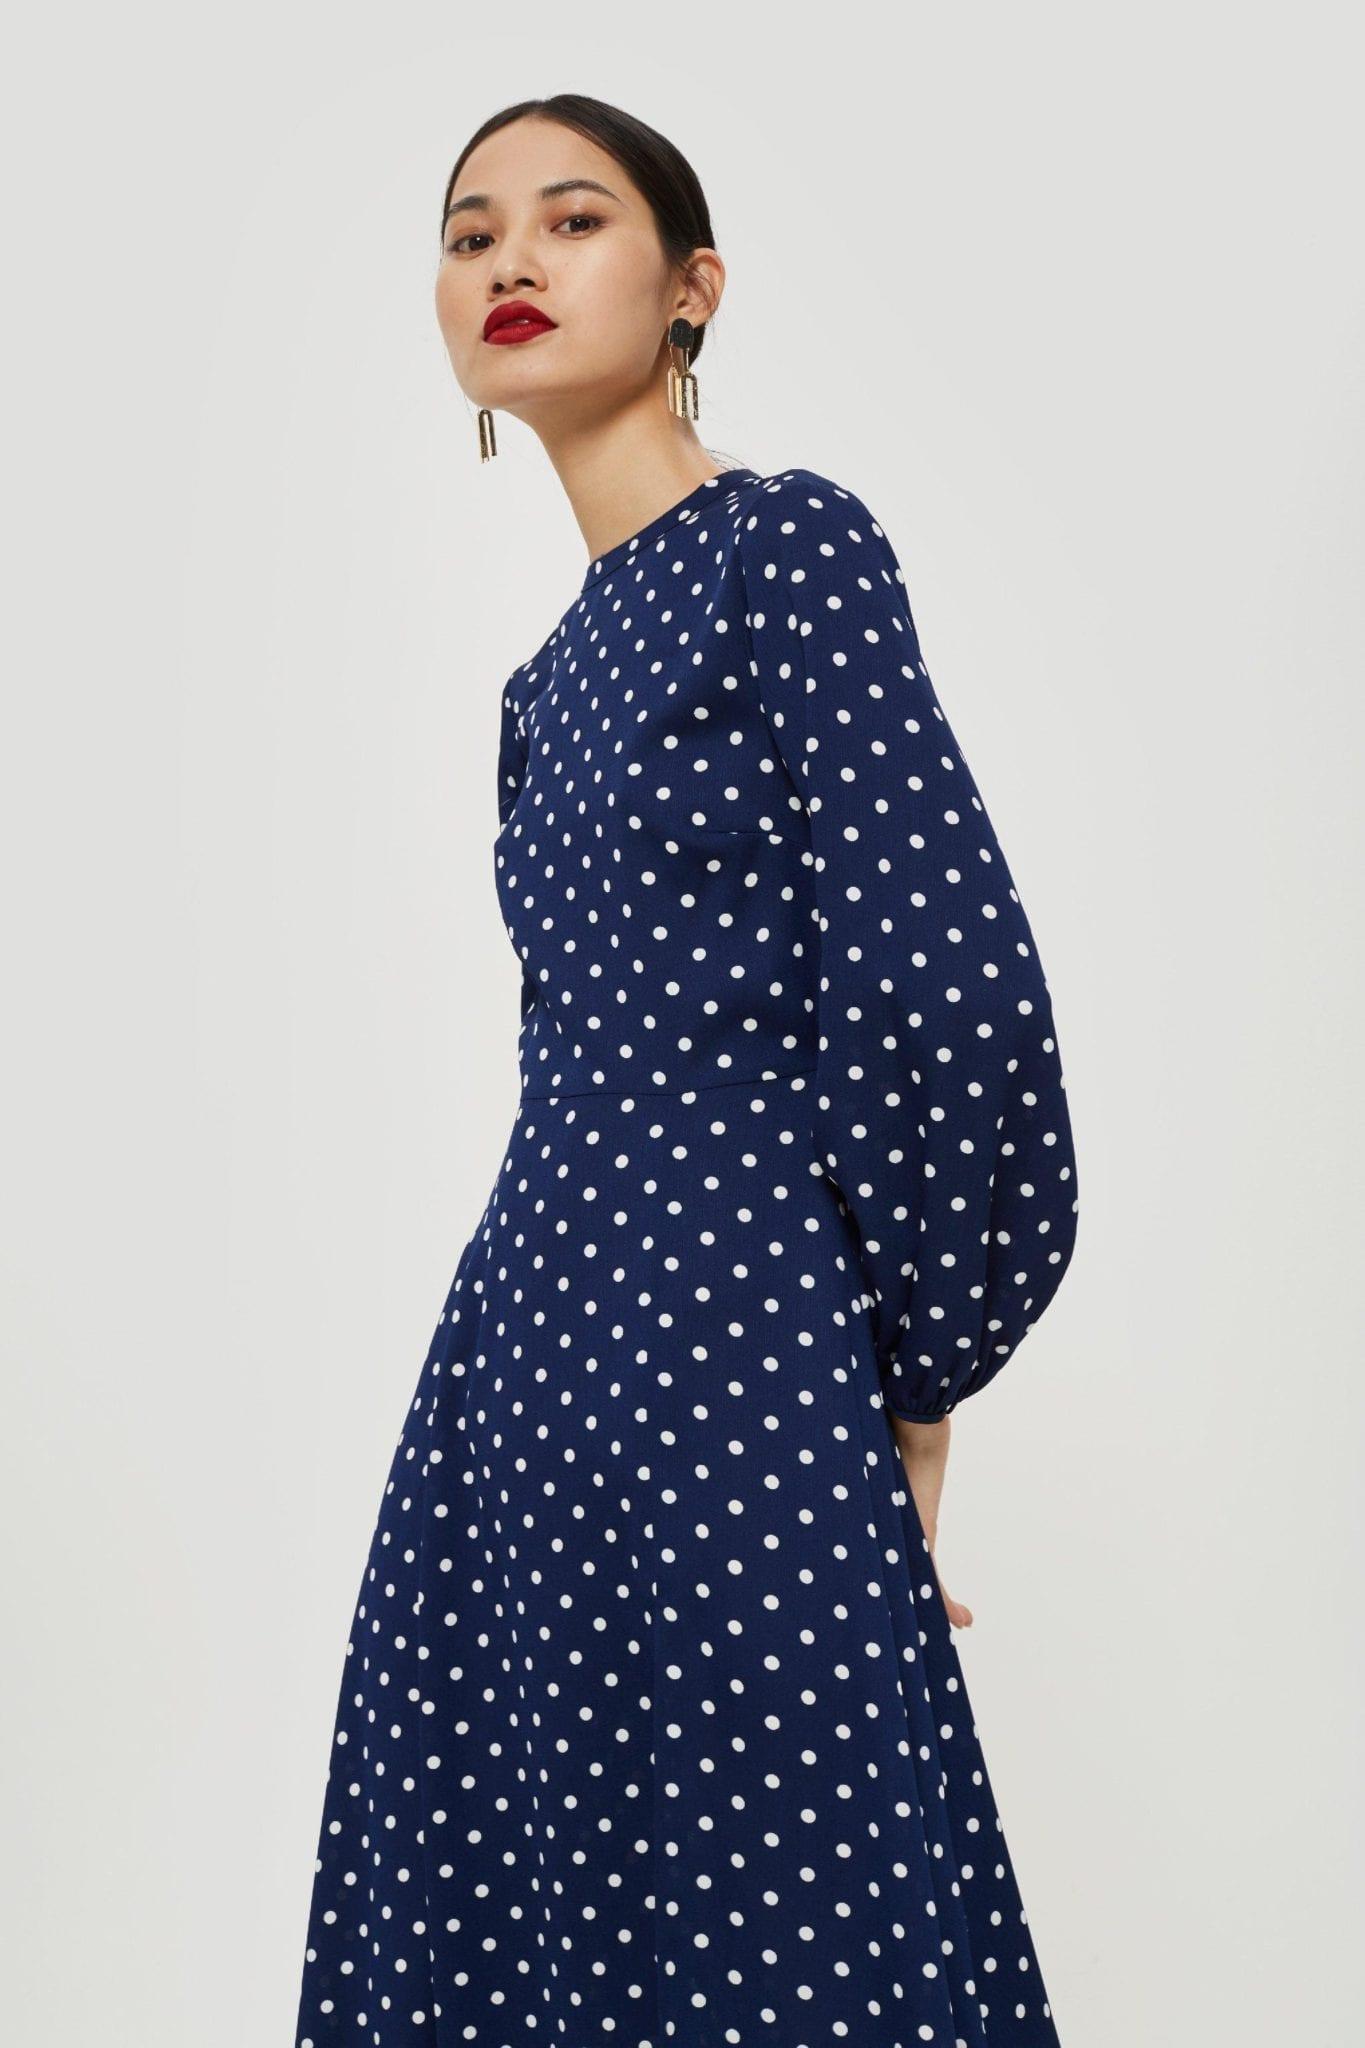 TOP SHOP Polka Dot Print Open Back Maxi Navy Blue Dress - We Select Dresses